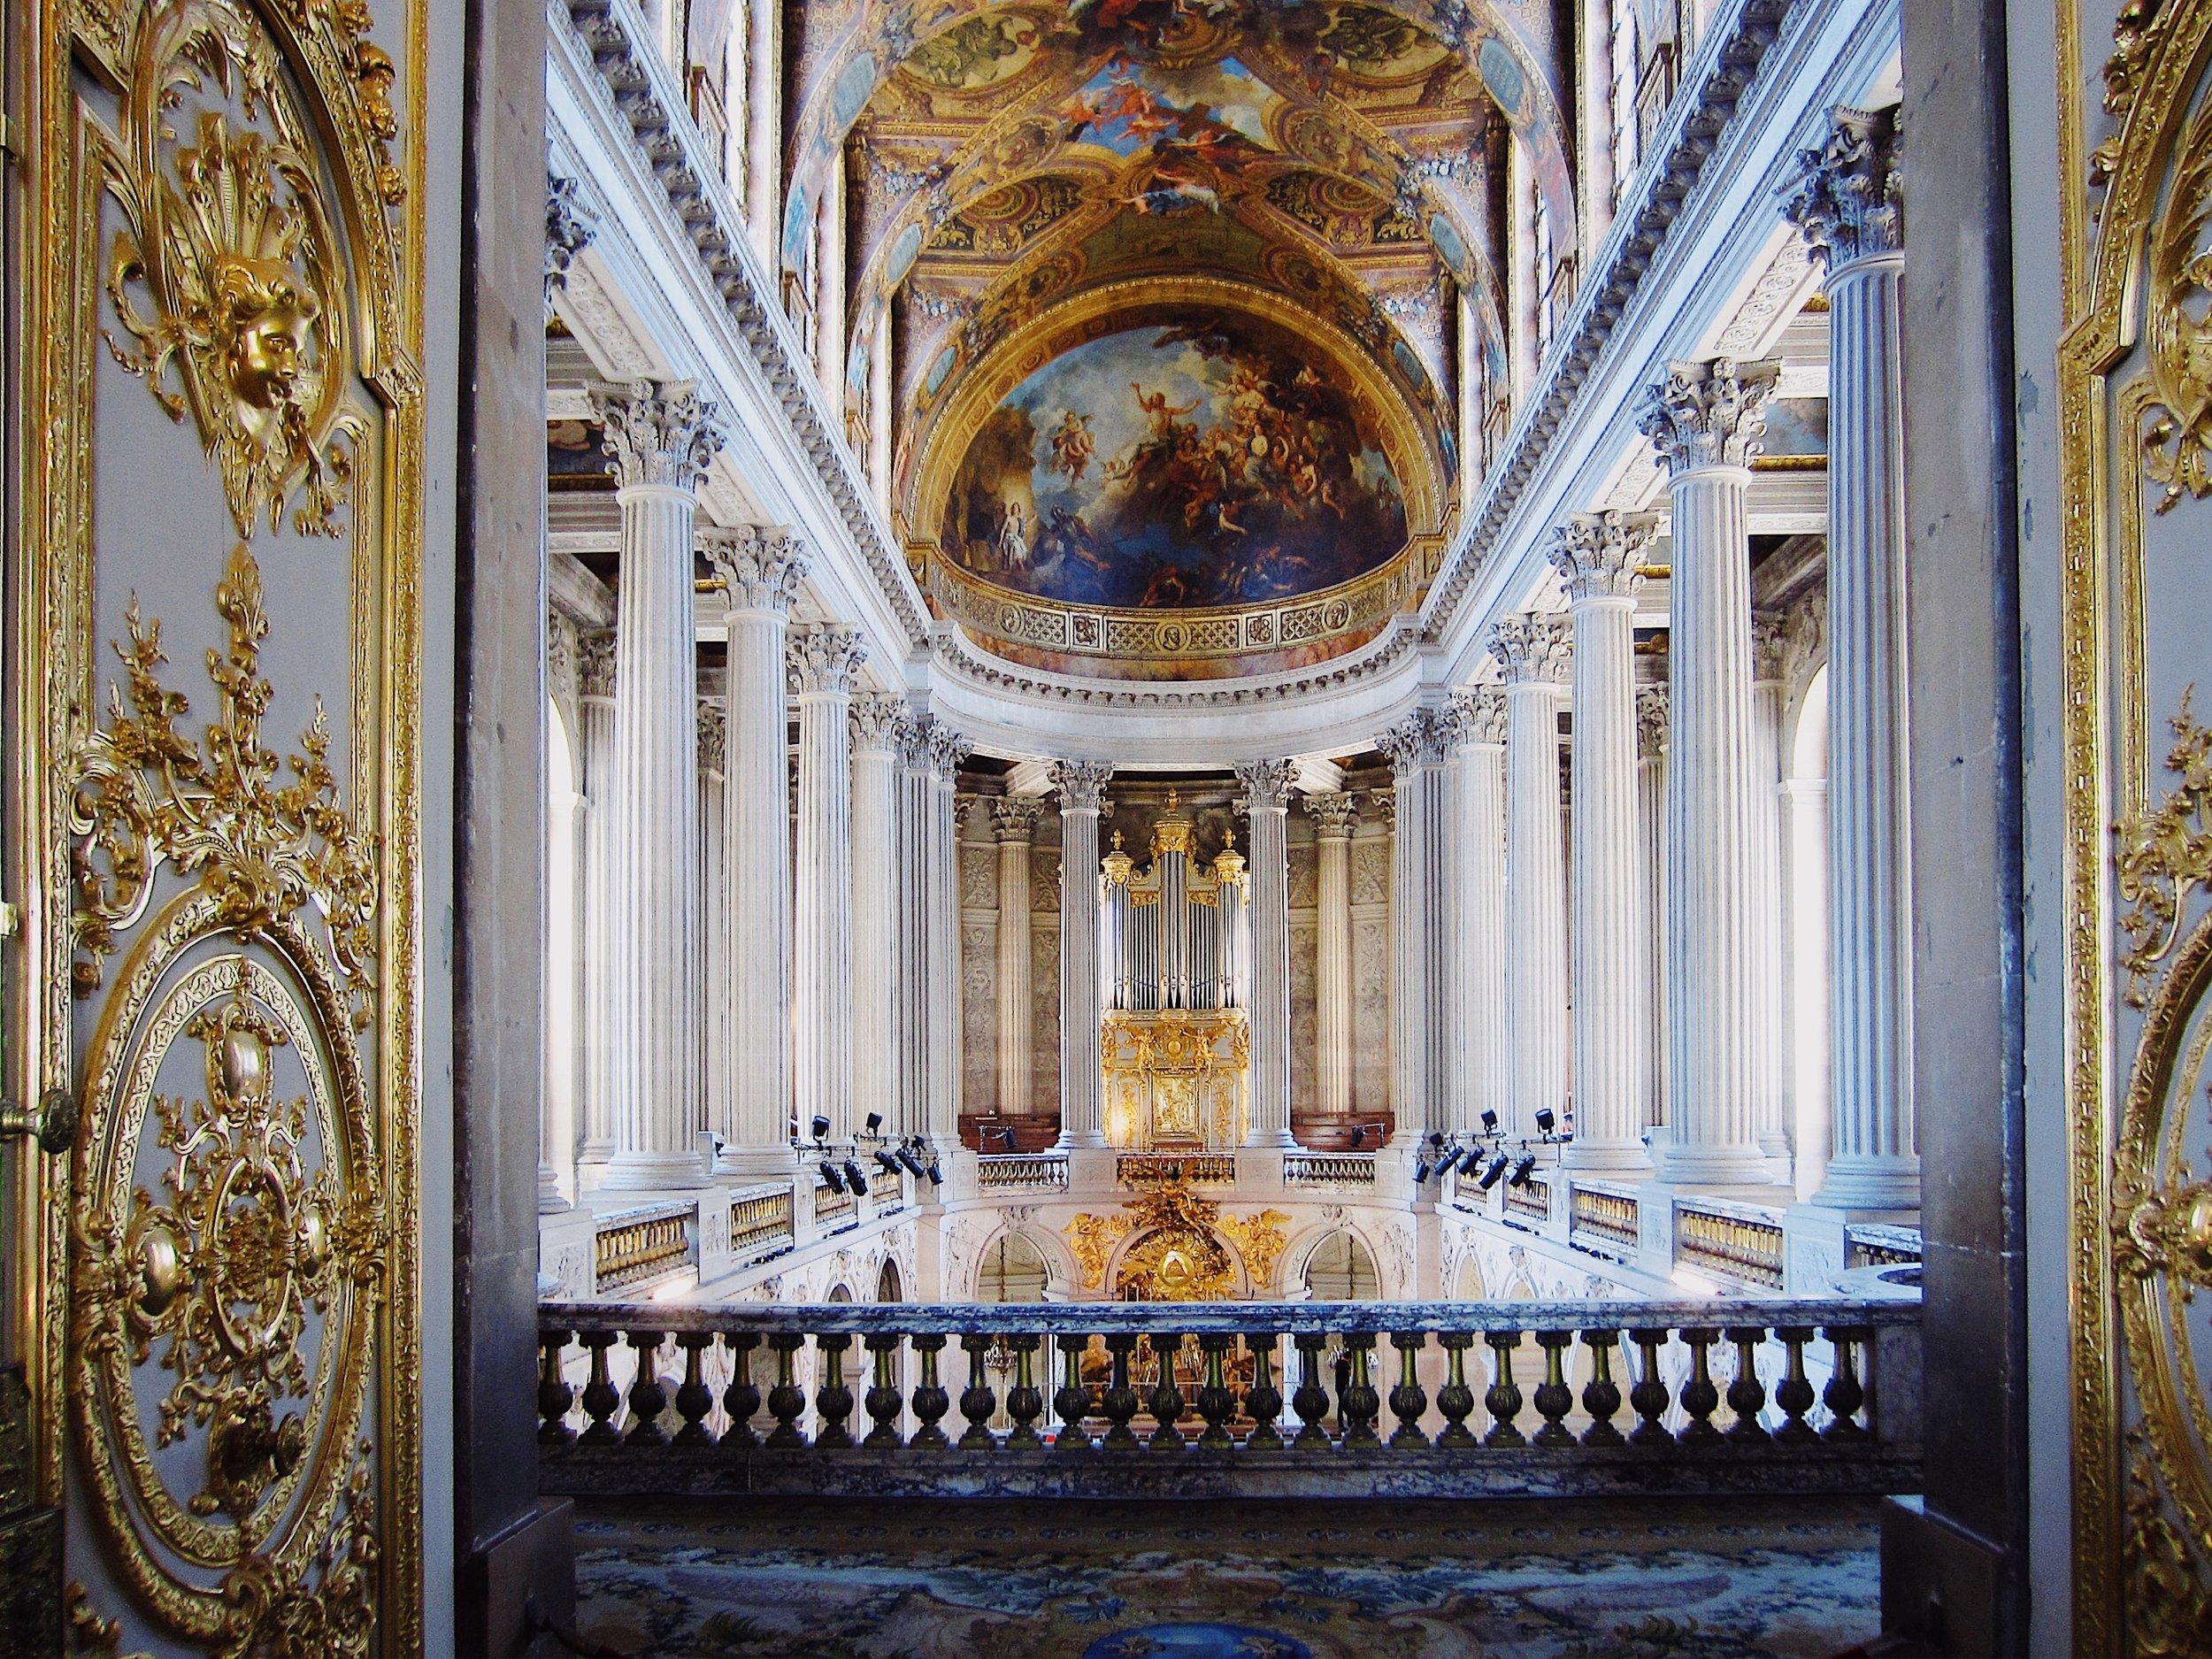 The Paris Bucket List - Palace of Versailles